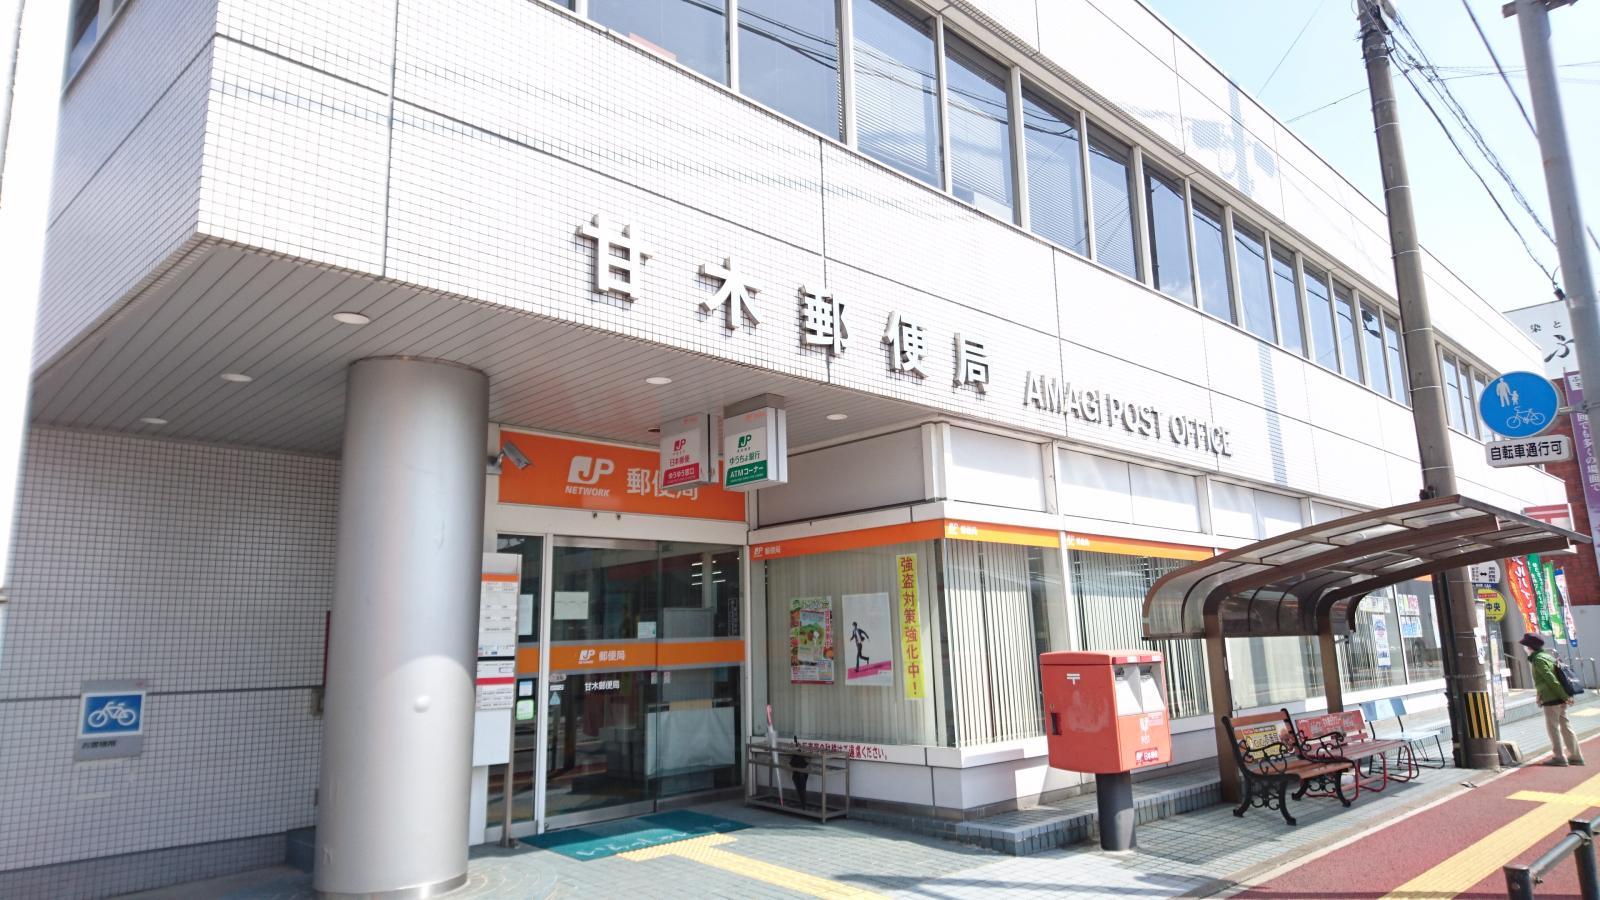 甘木郵便局(朝倉市)の投稿写真...